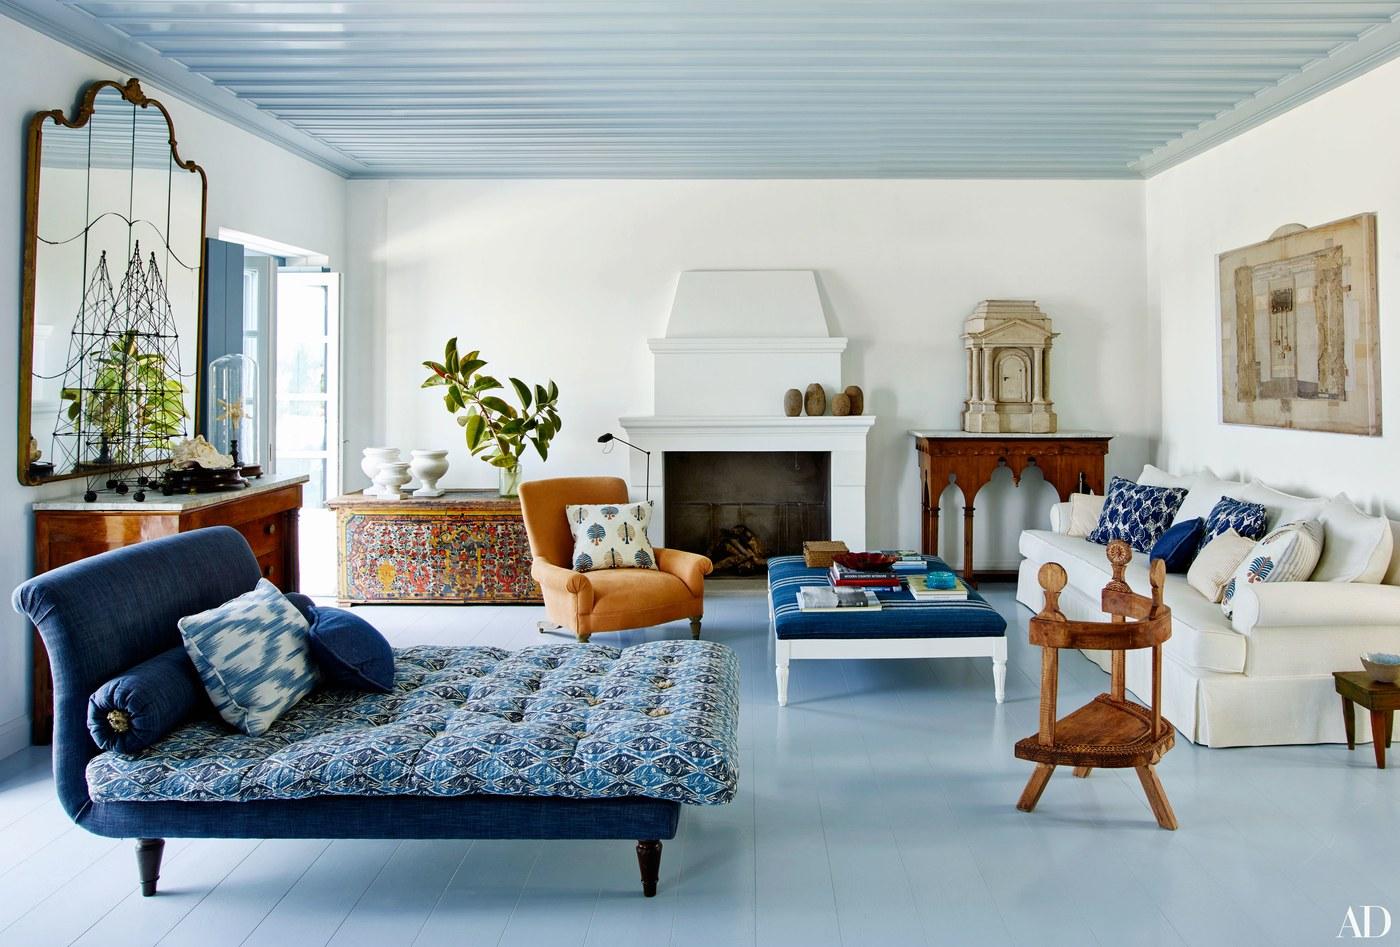 2-visita-guiada-casa-de-ferias-grega-investe-no-azul-claro-praiano